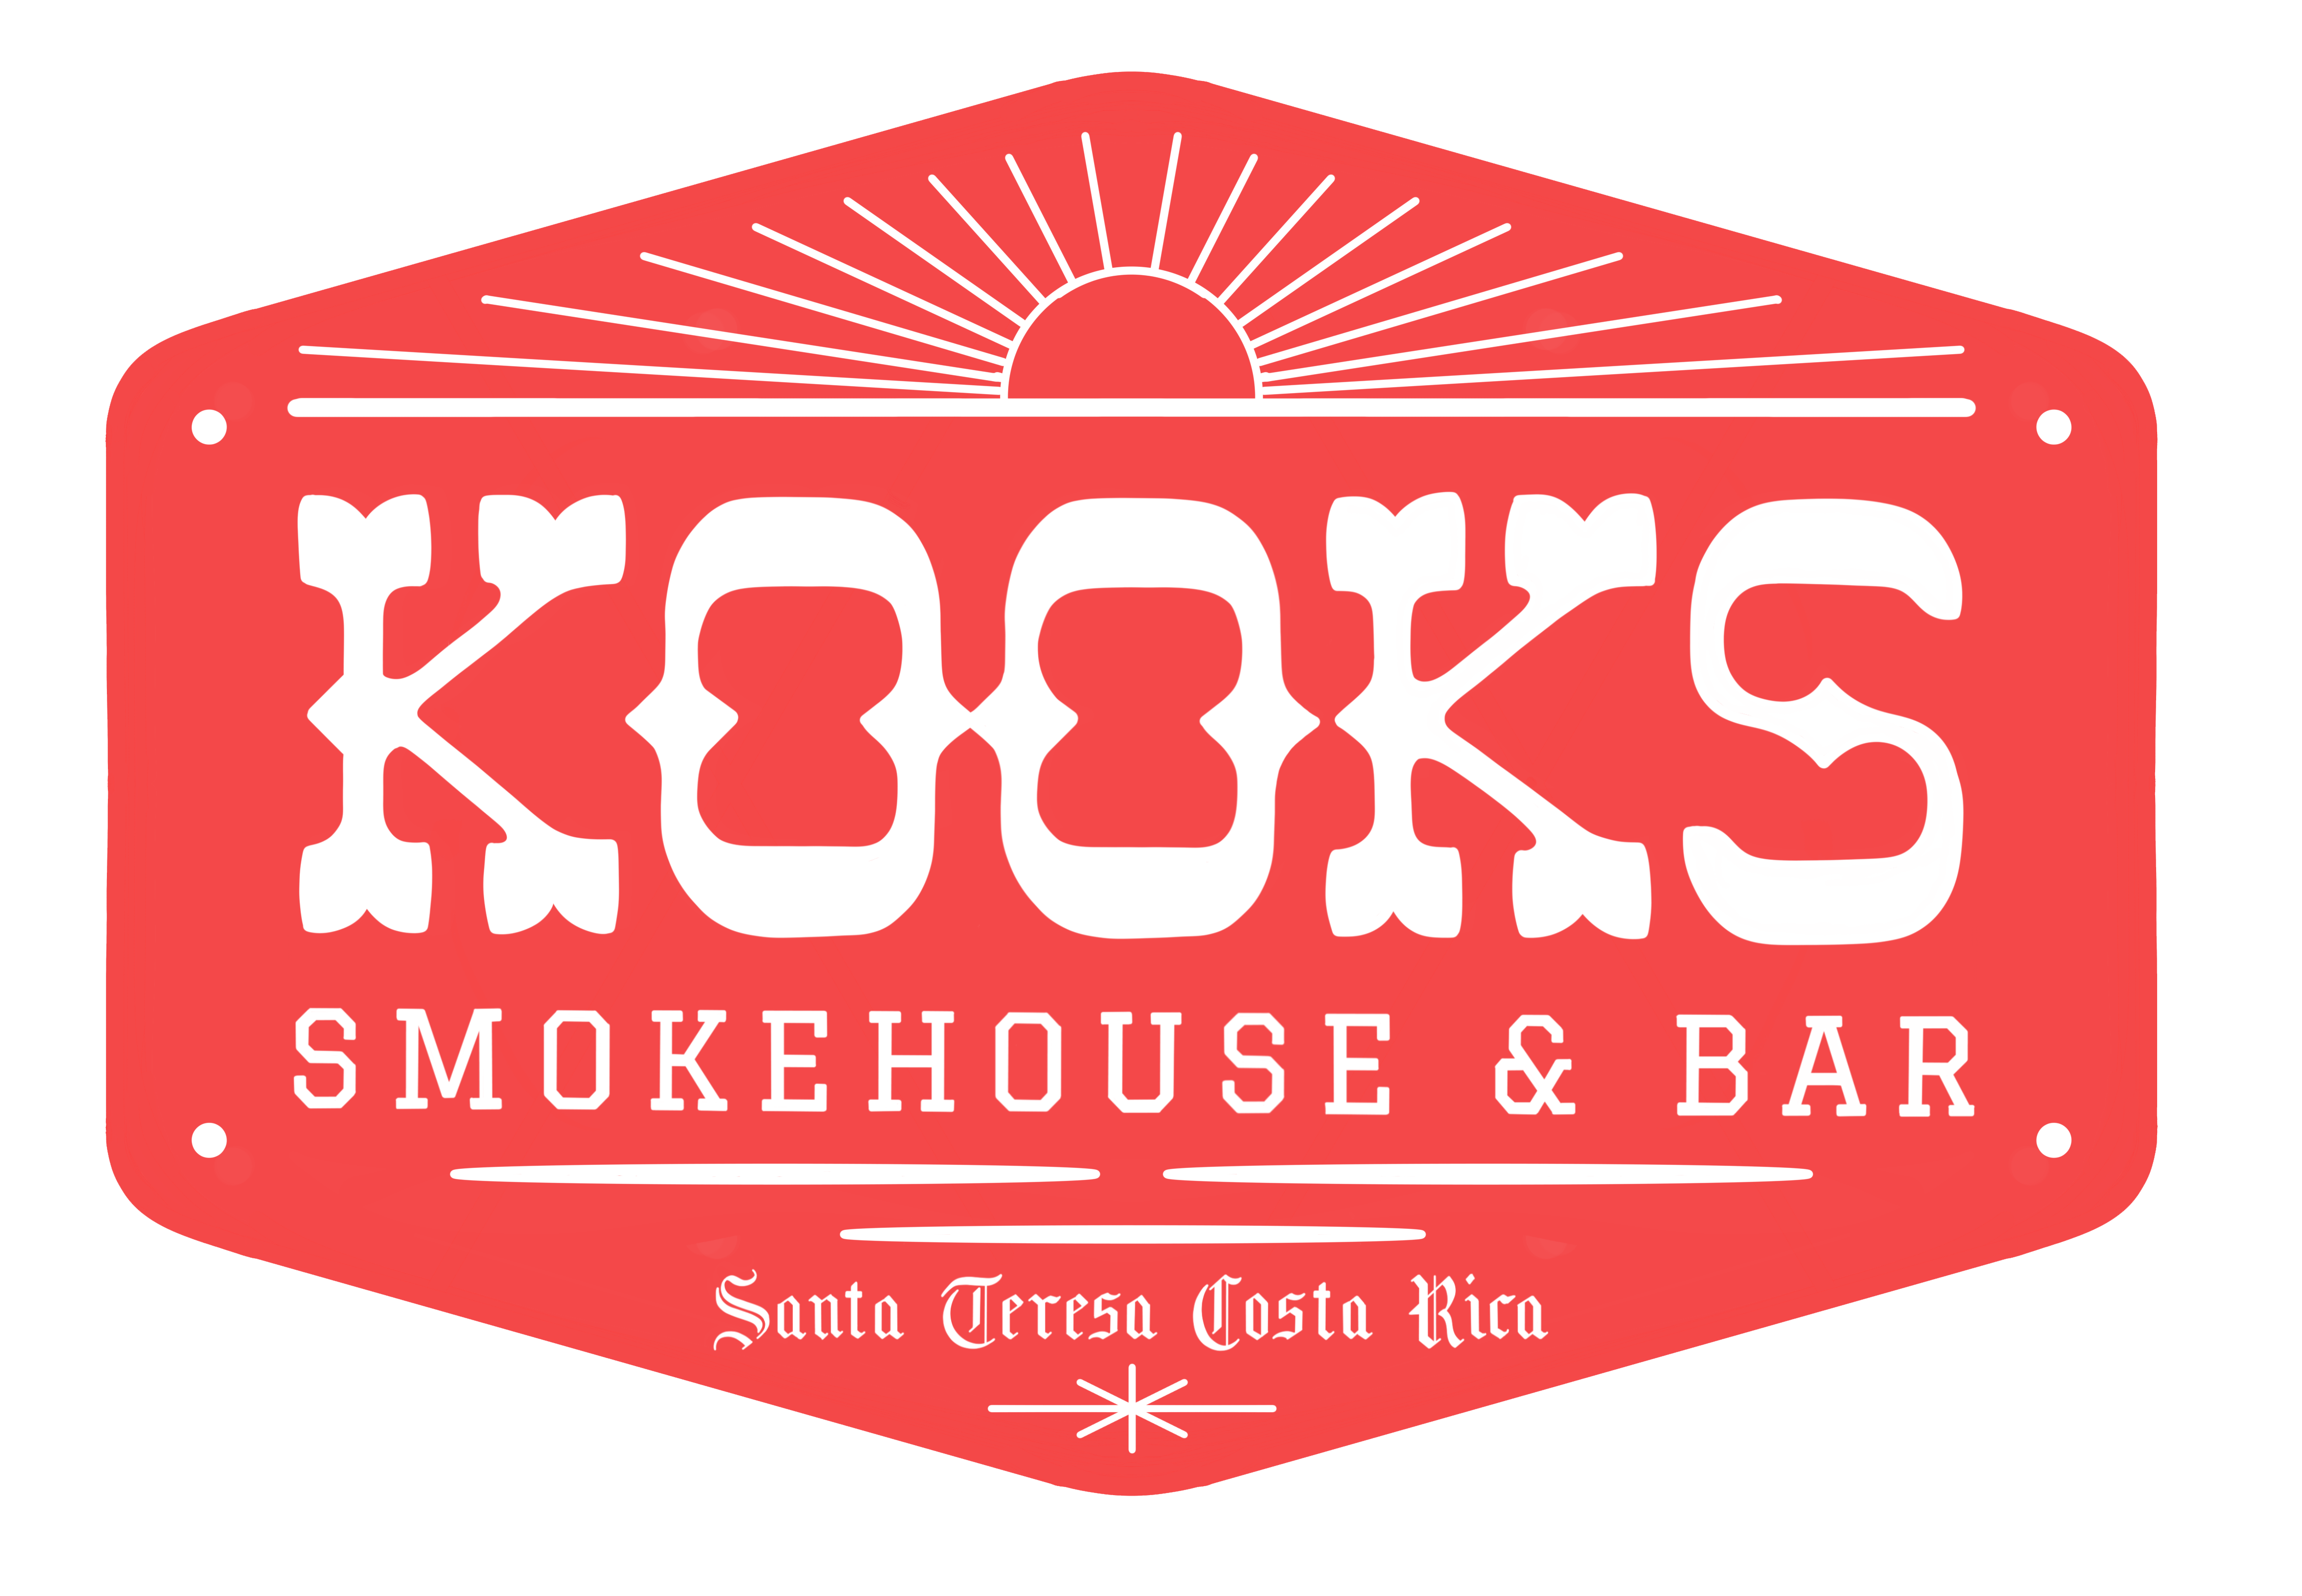 Kooks Smokehouse & Bar